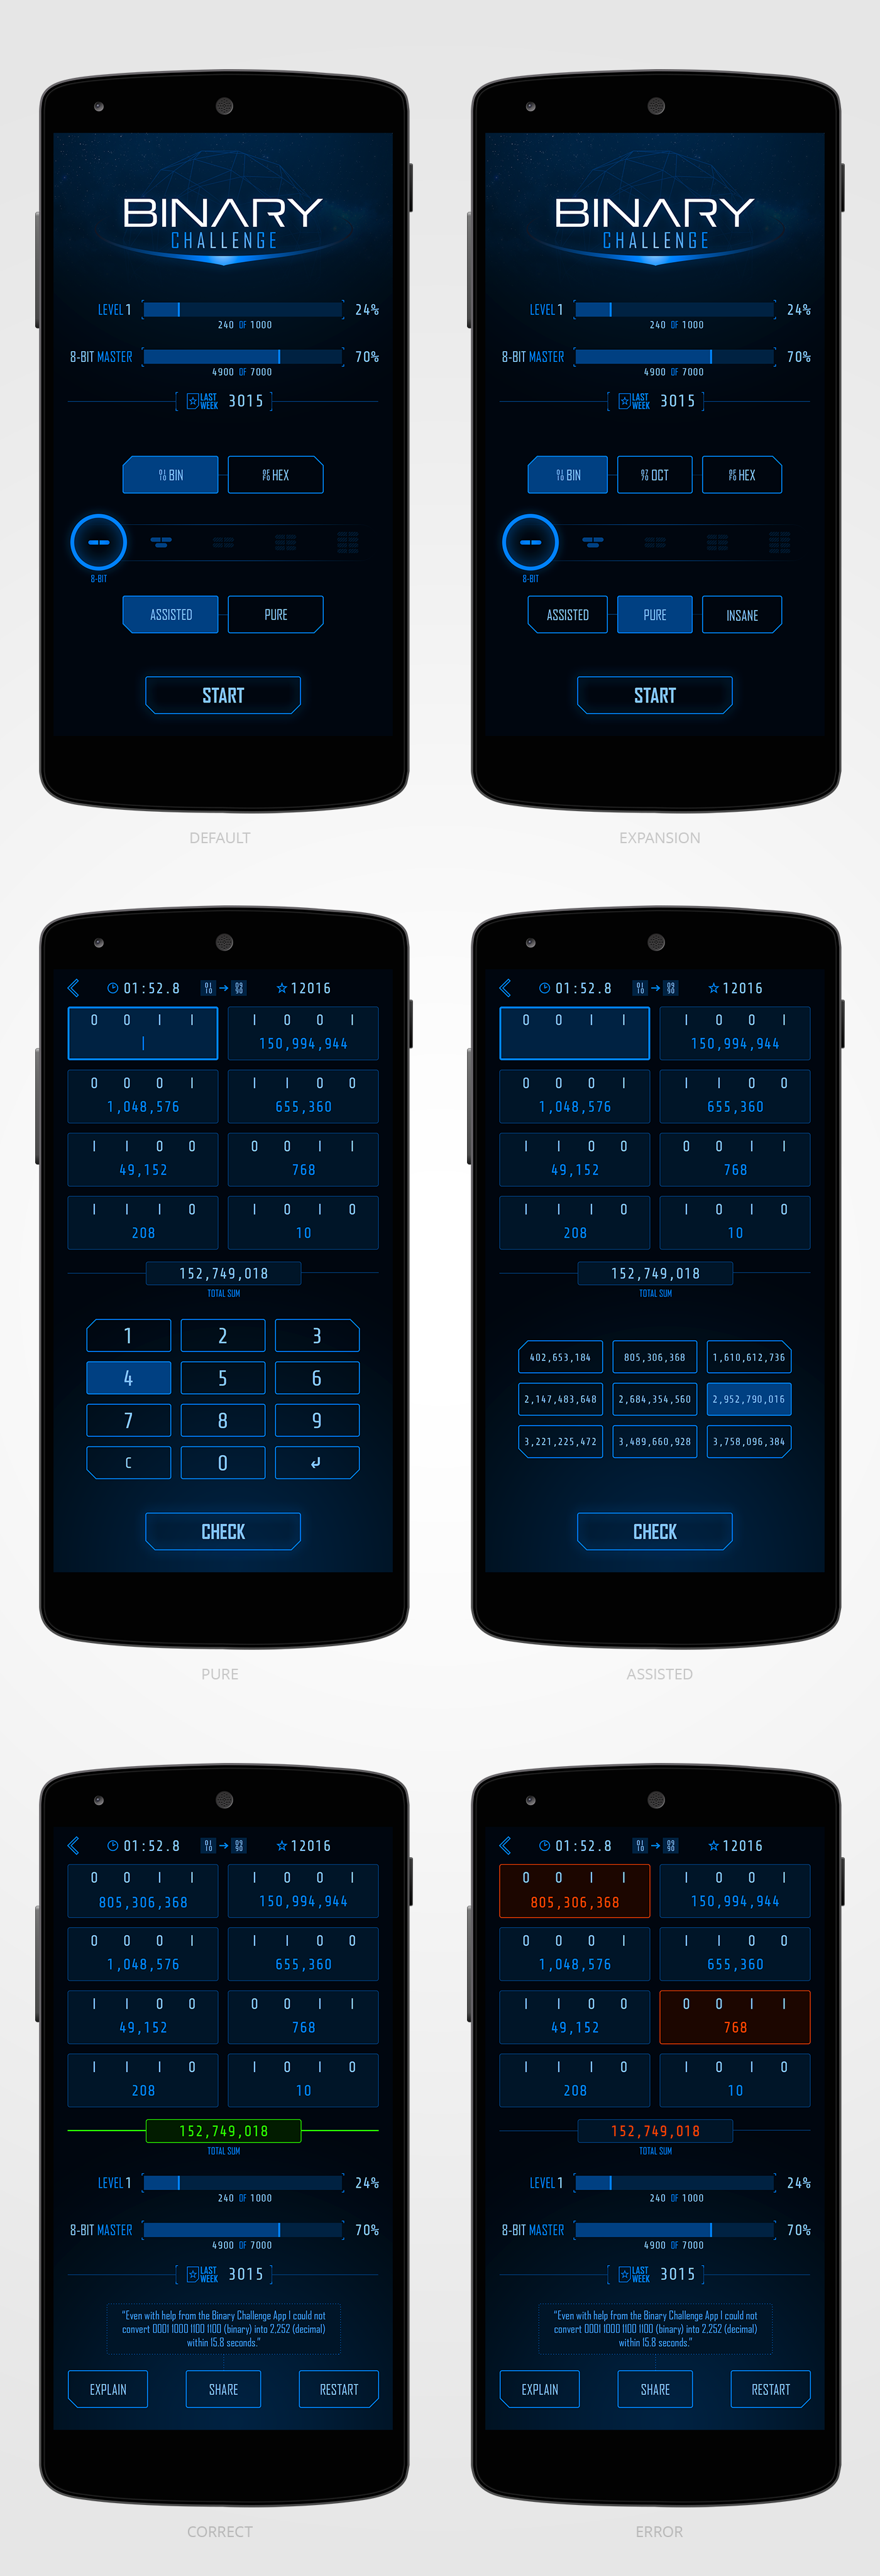 App Design - Binary Math-Game for Nerds